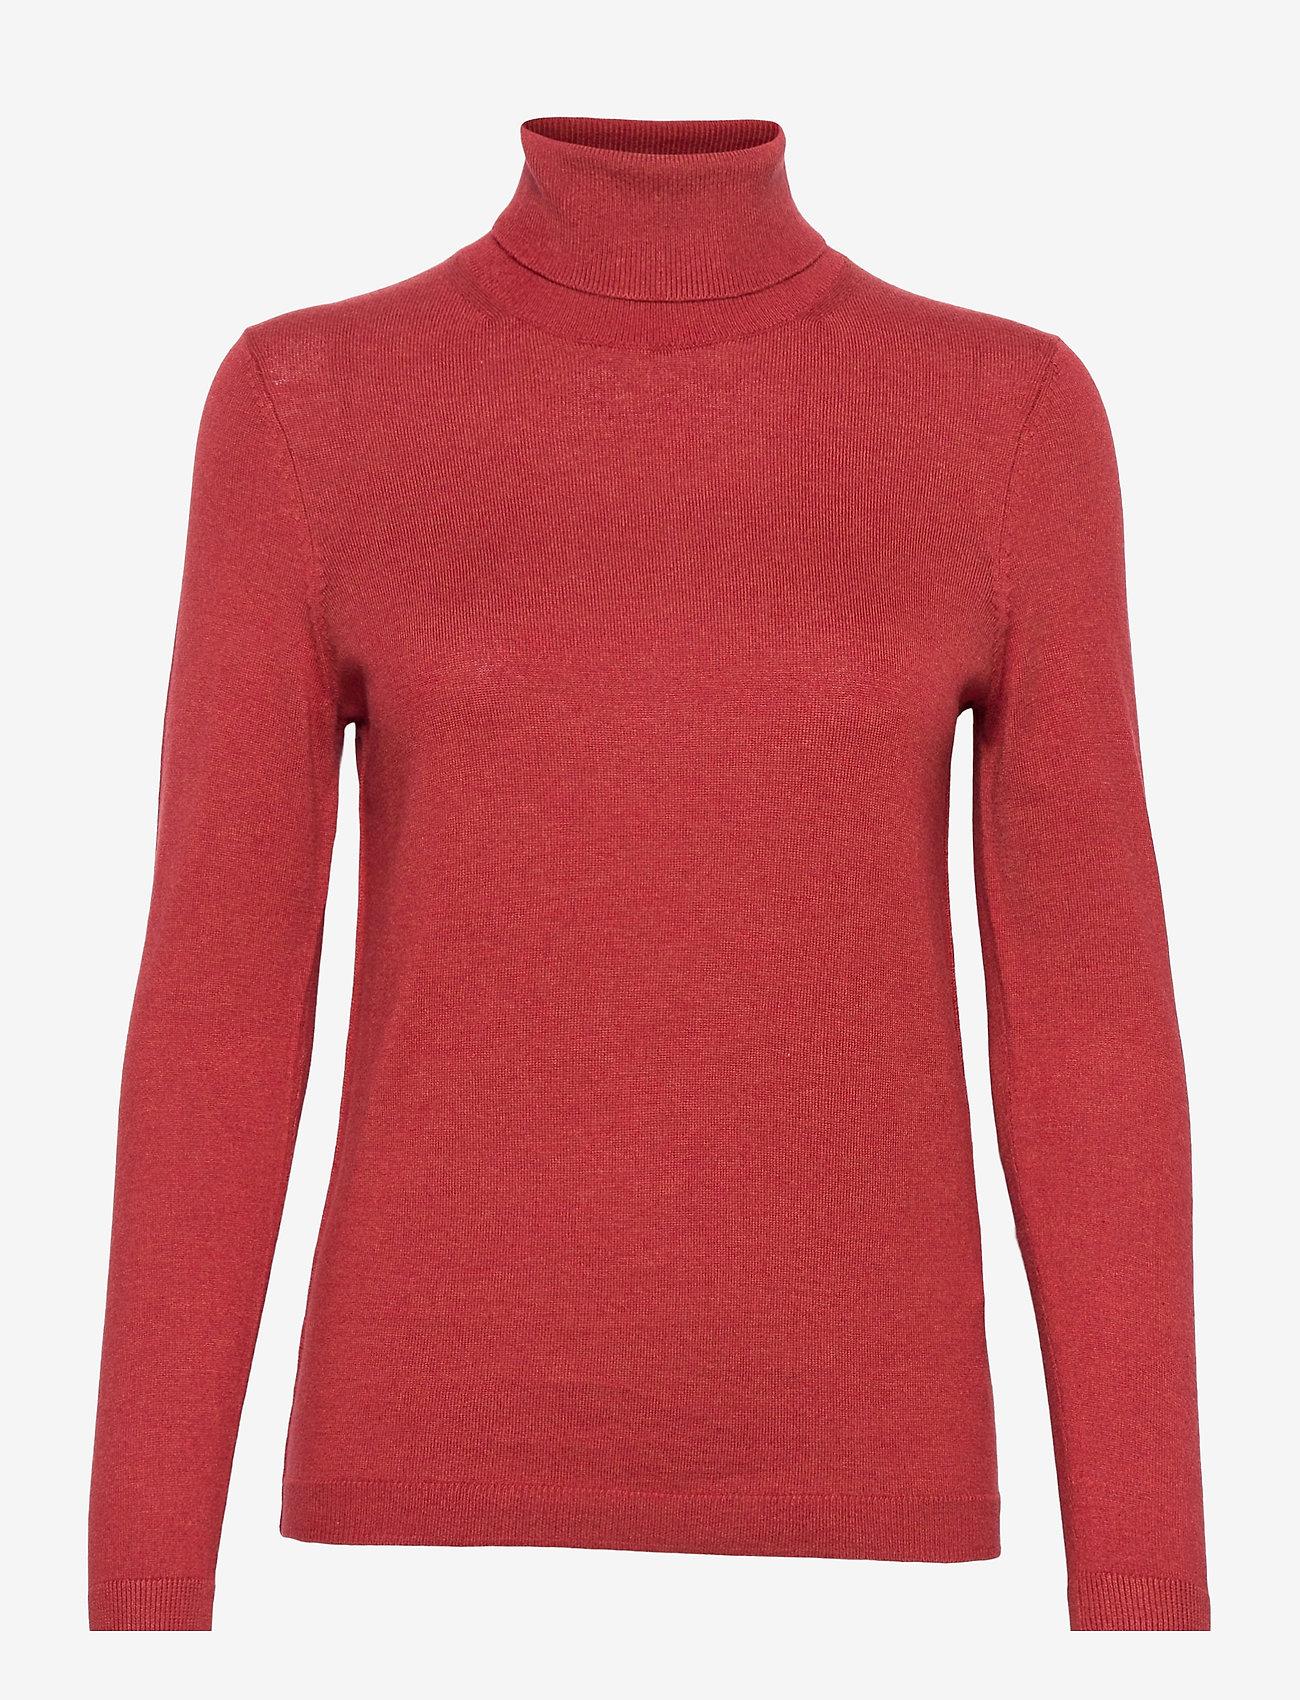 EDC by Esprit - Sweaters - turtlenecks - terracotta 5 - 0